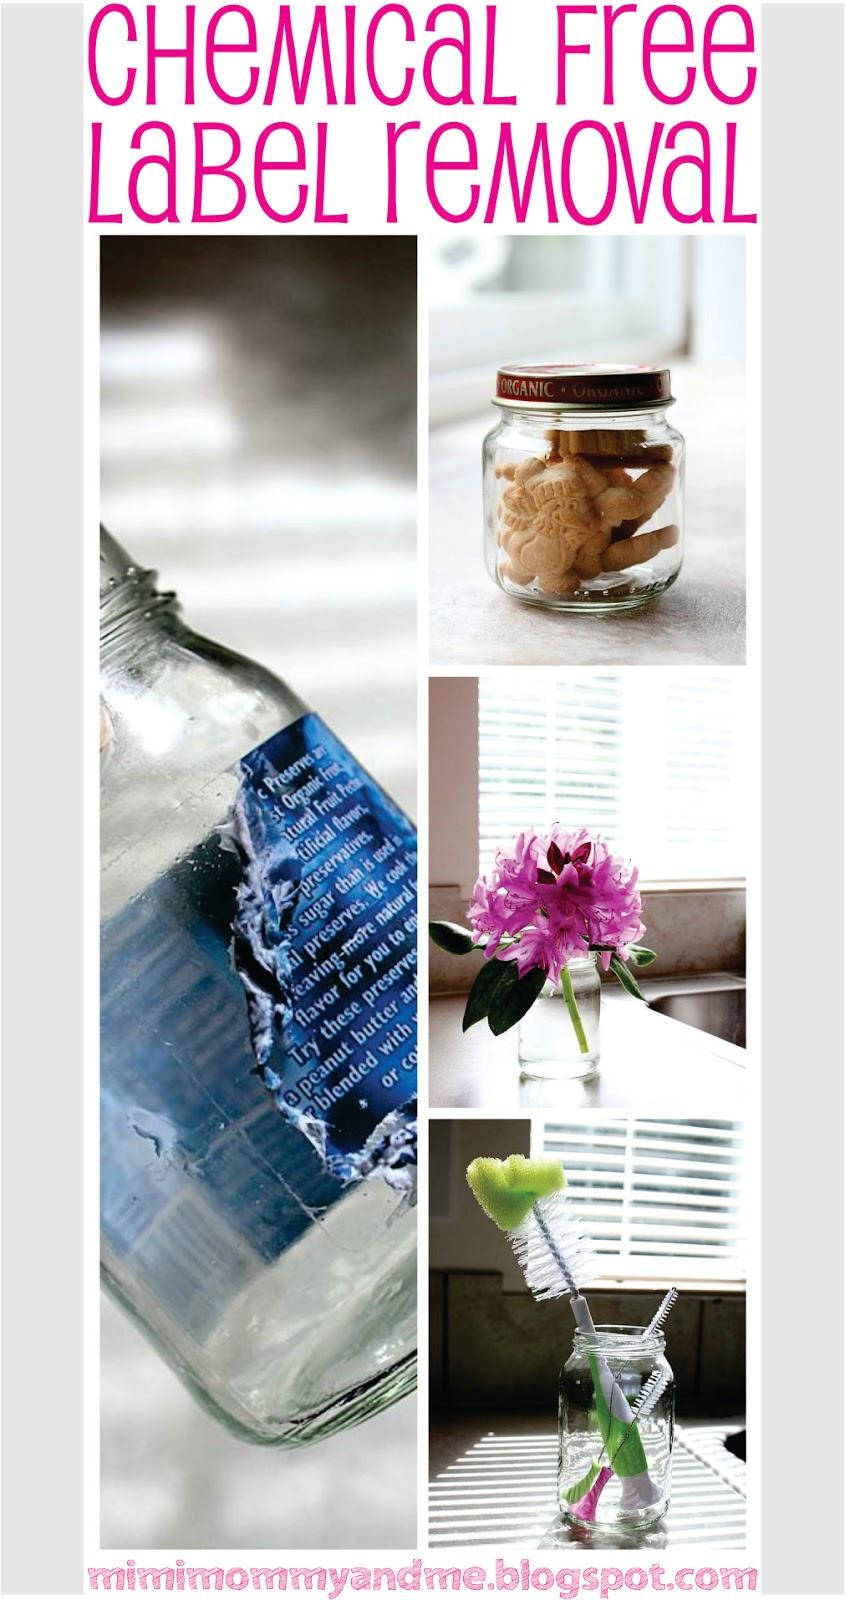 http://mimimommyandme.blogspot.com/2014/06/chemical-free-label-removal-easiest-way.html #removelabel #chemicalfree #jar #glassjar